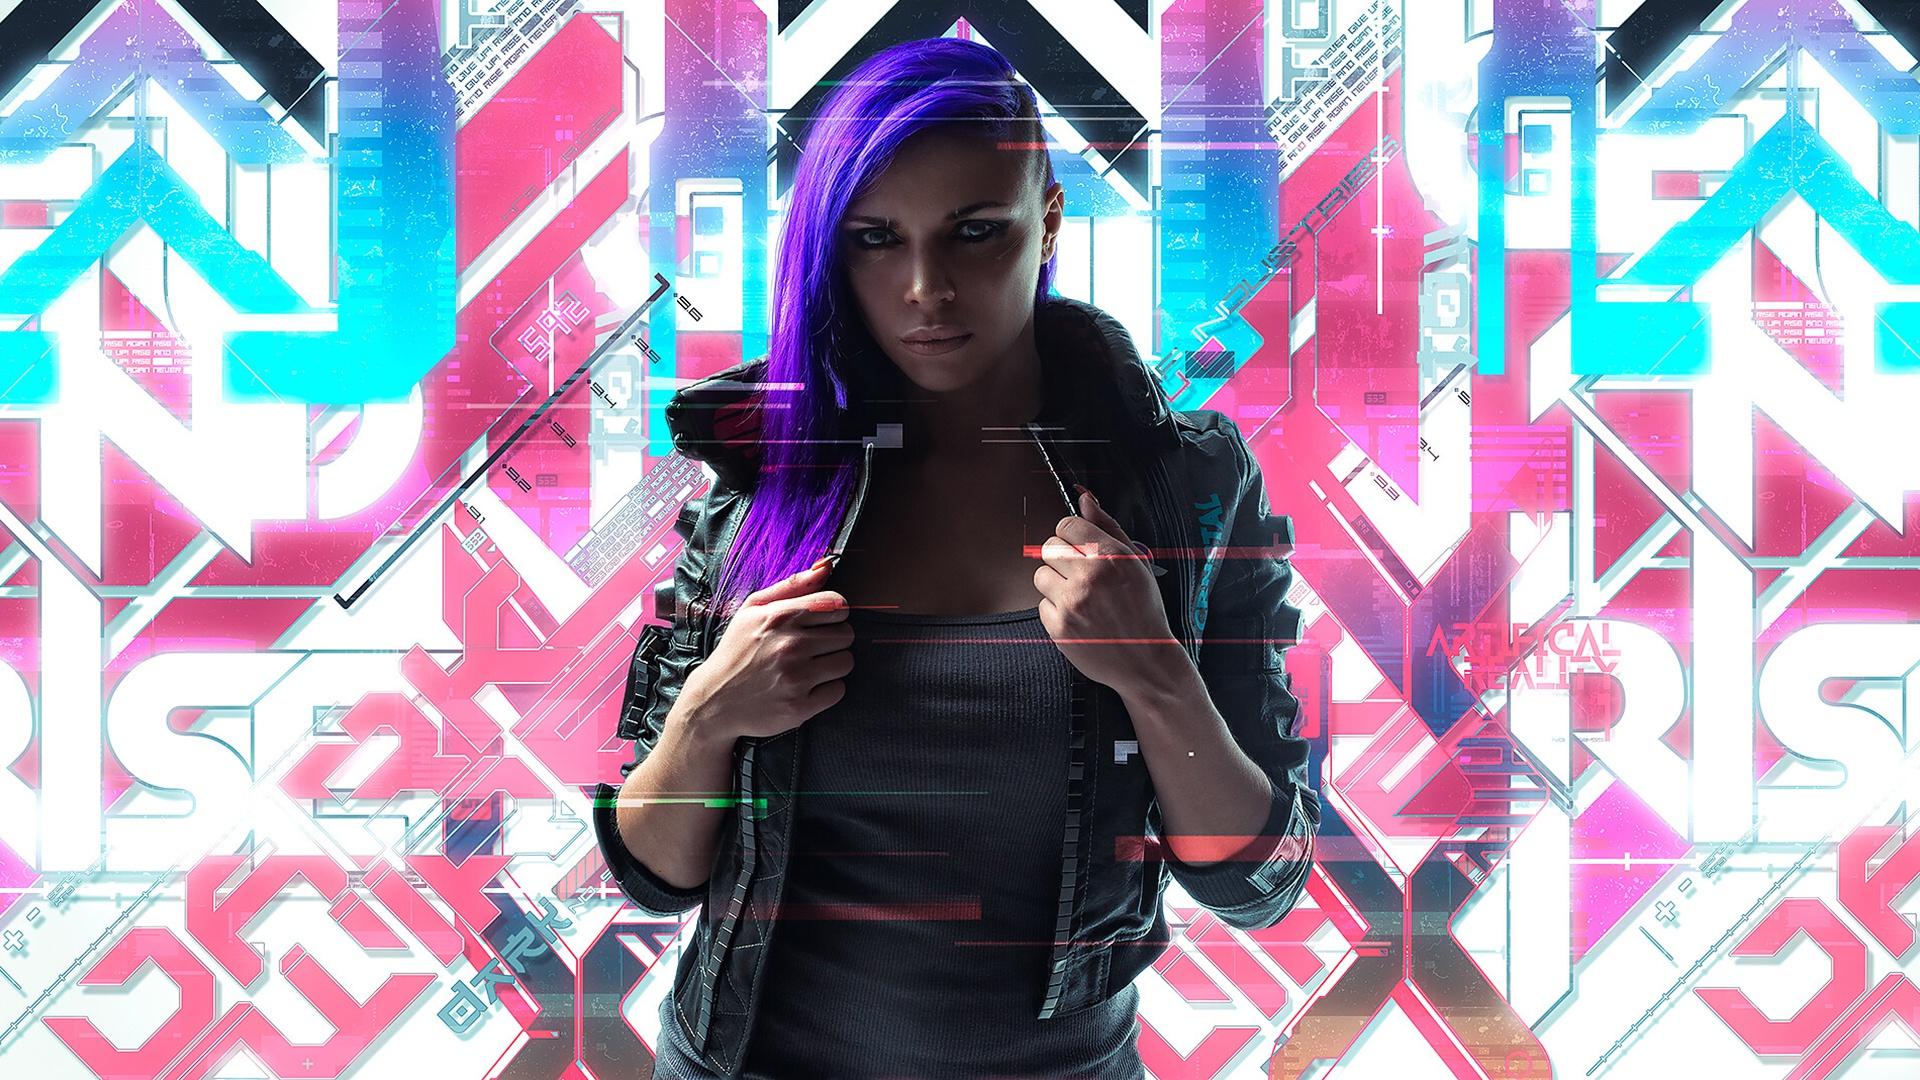 Cyberpunk 2077 street art